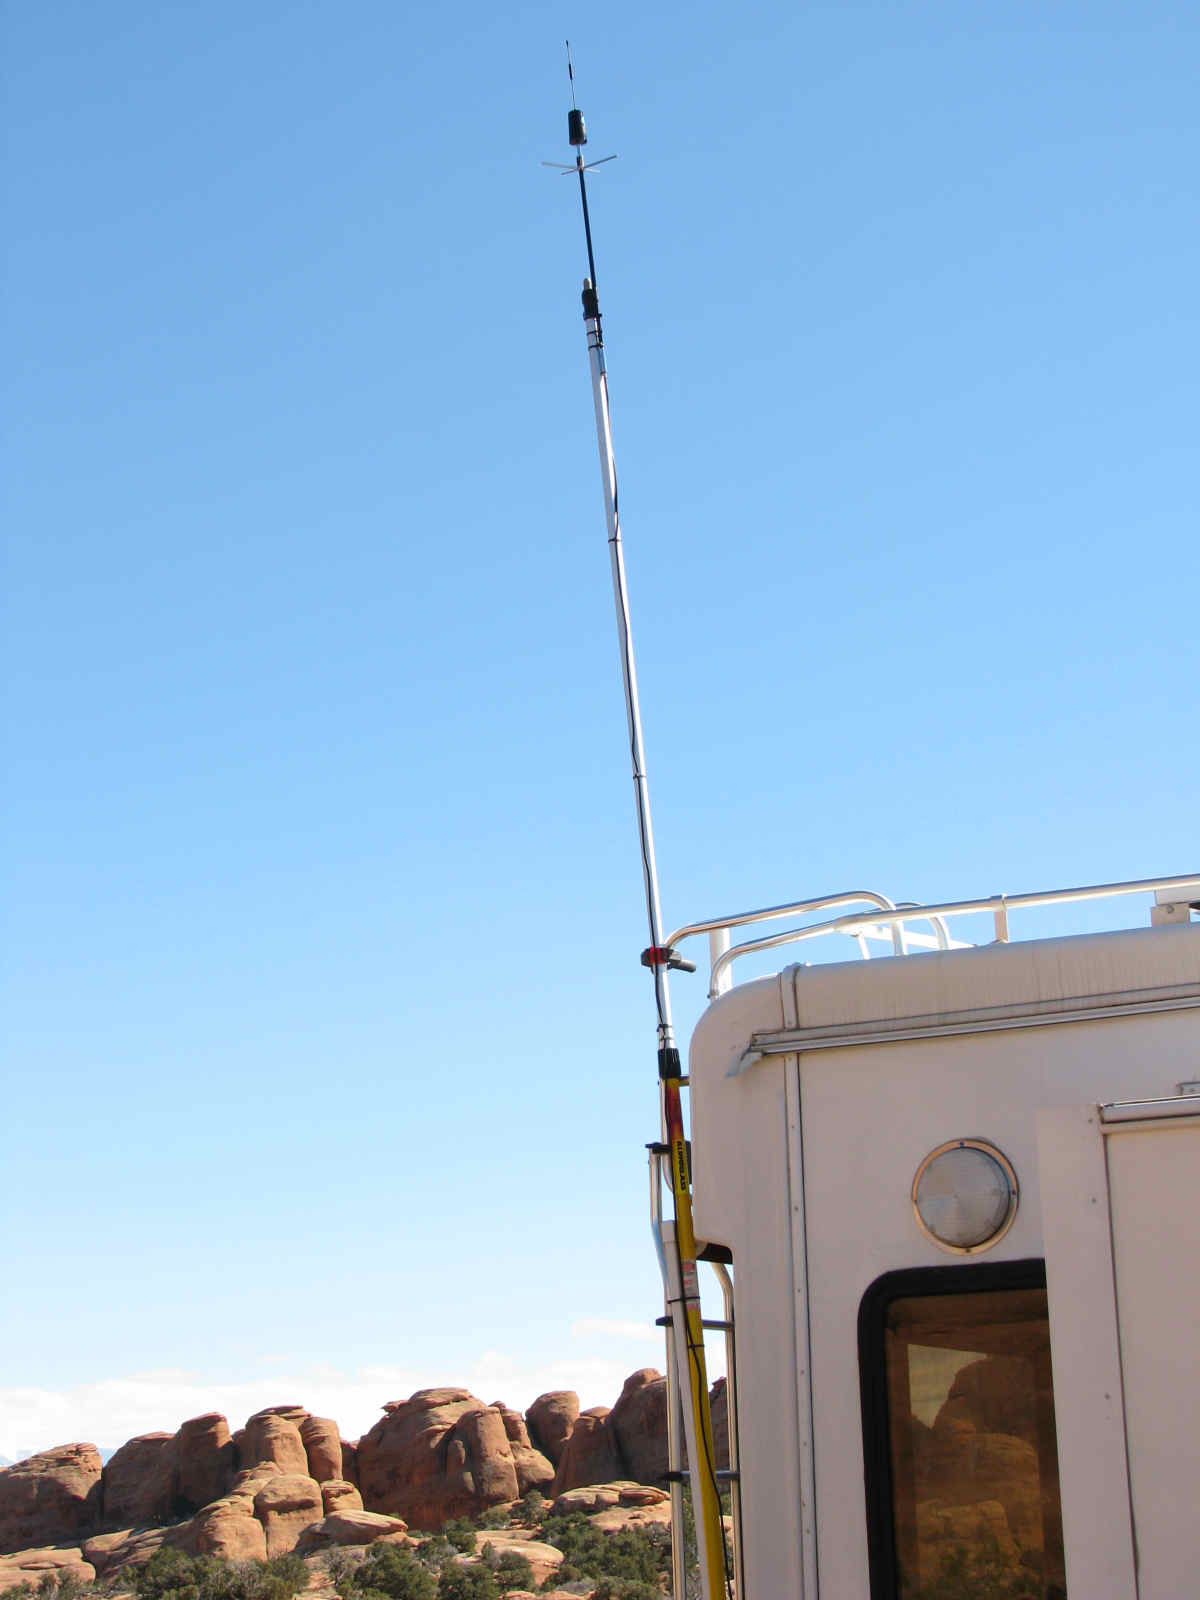 1fe4291bcf7 Cell antenna on pole.jpg (68139 bytes)